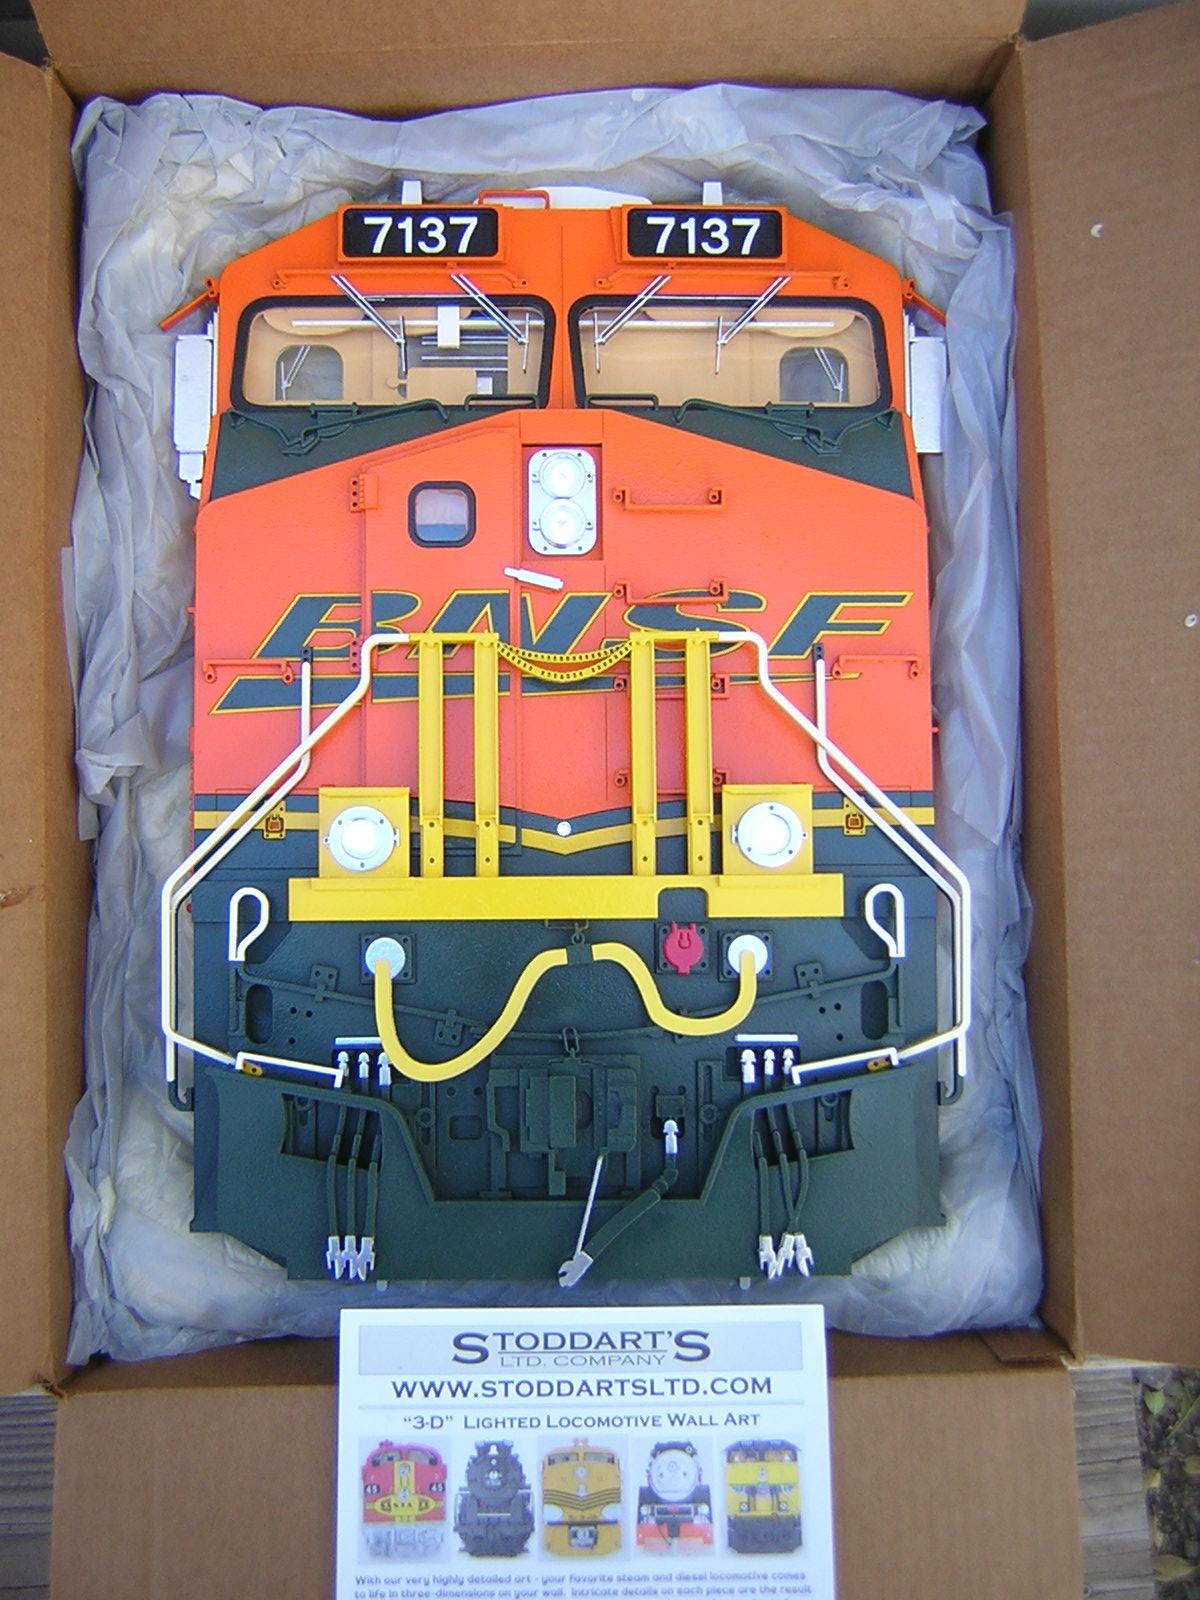 Stoddartsltd com BNSF ES44AC #1   TrainBoard com - The